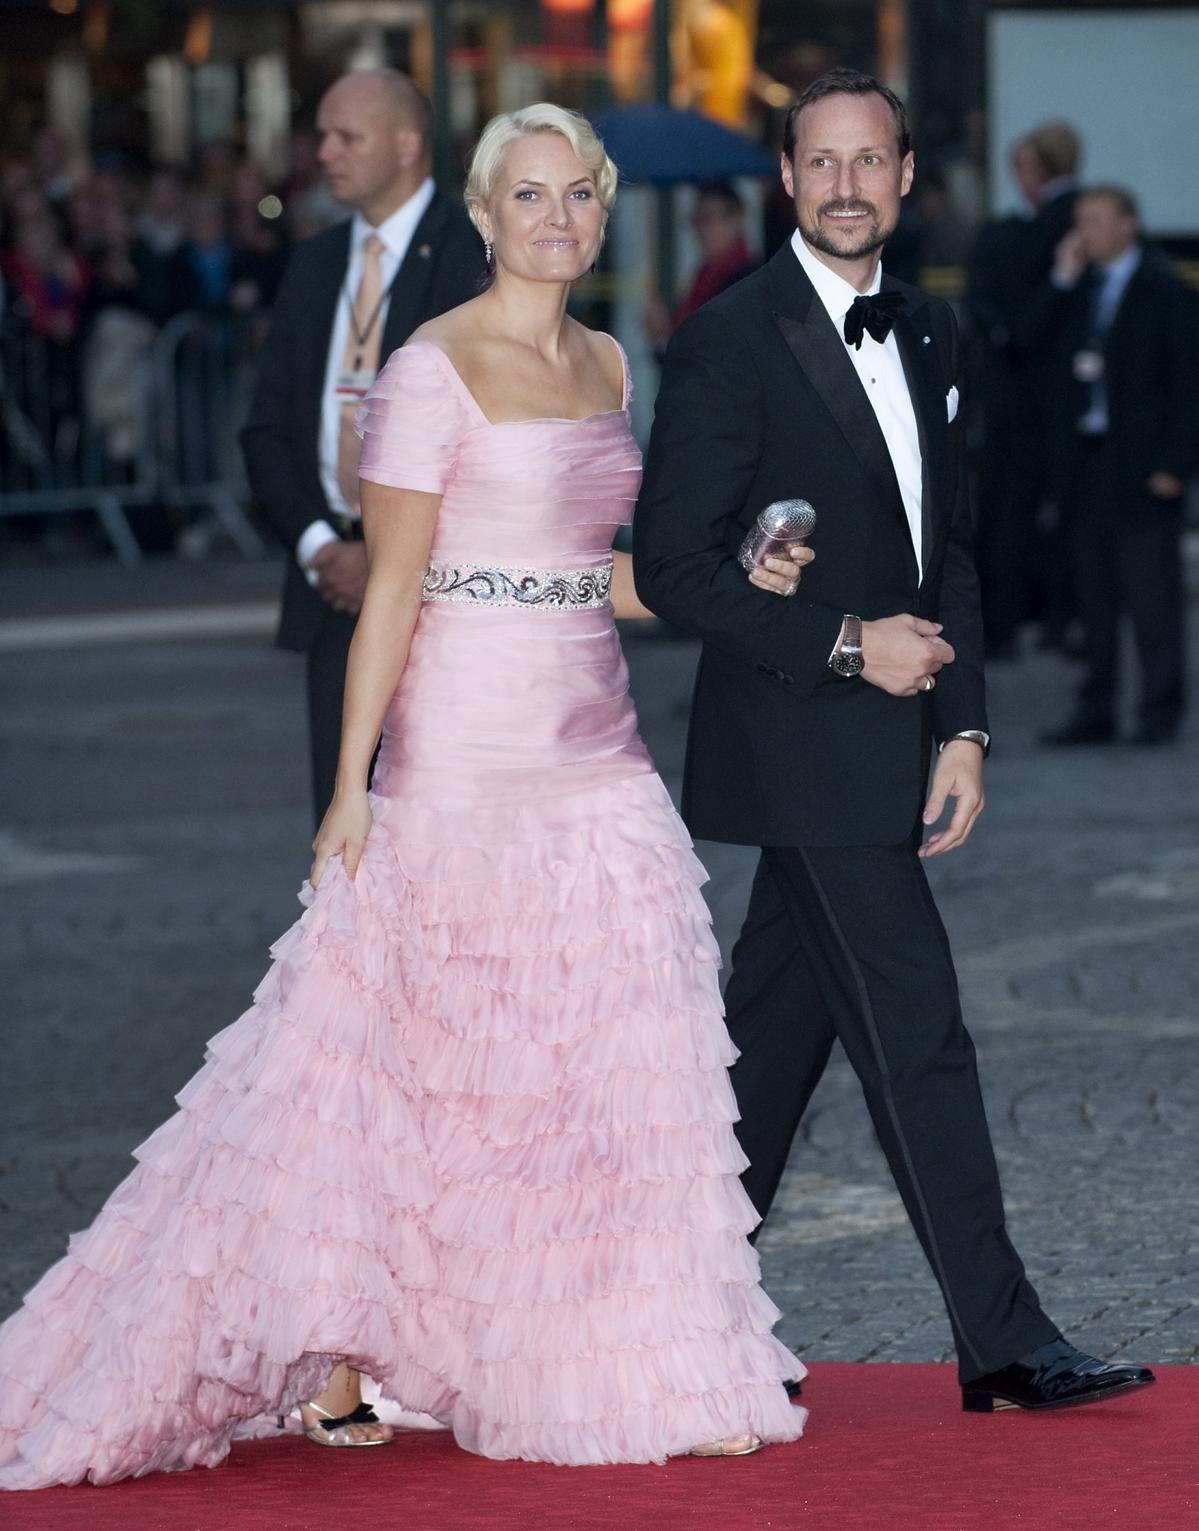 Mette-Marit z księciem Norwegii